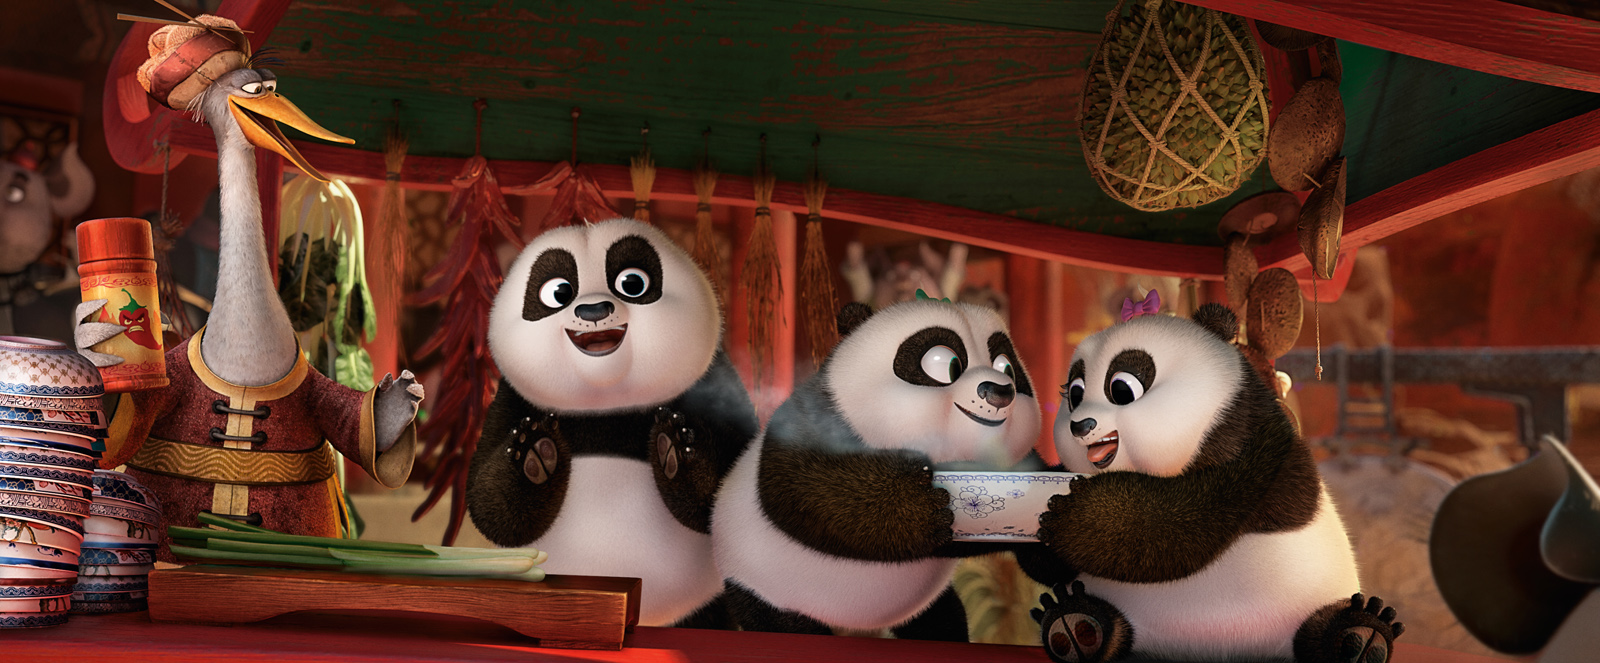 Kung-Fu-Panda-3-Review-2